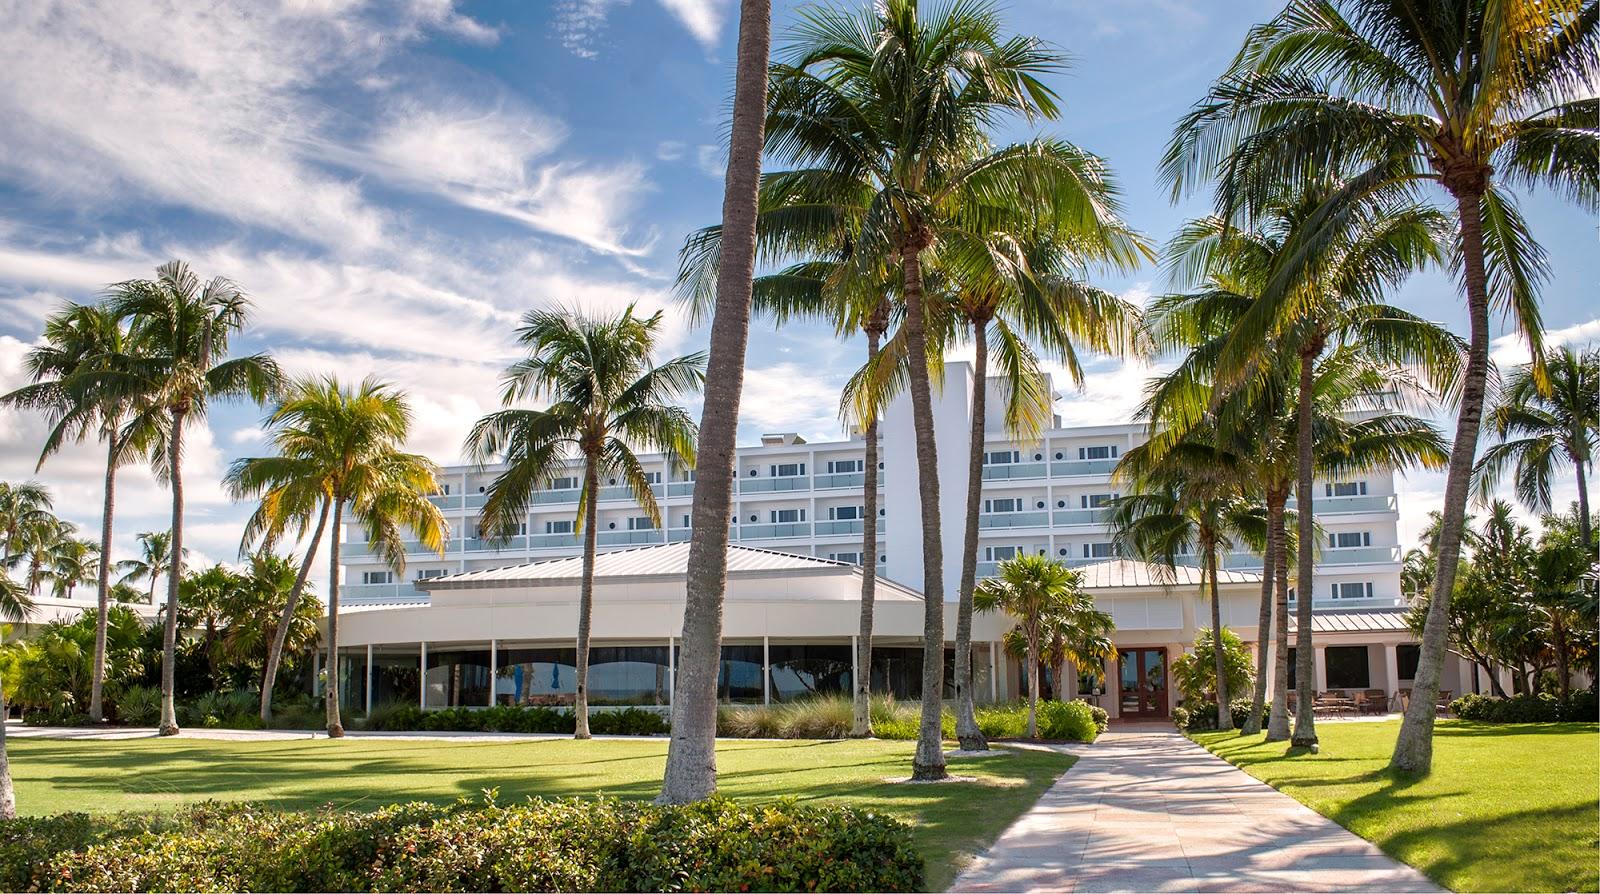 The golf travel guru on location naples beach hotel for Hotels naples